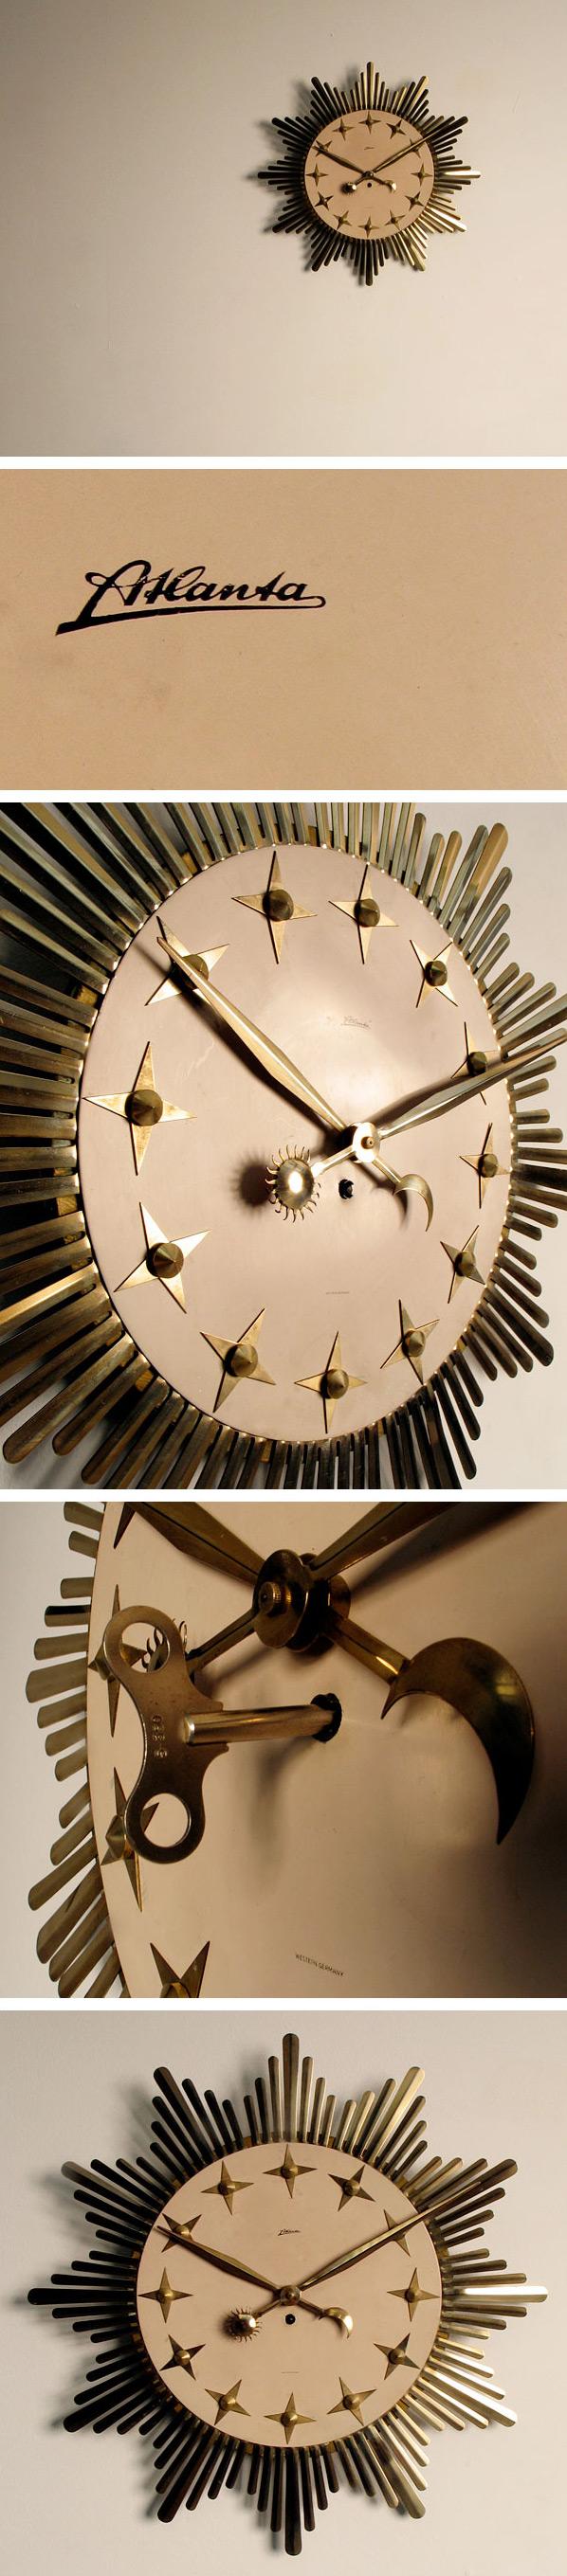 Metal Star Atlanta Sunflower clock 1950 Large